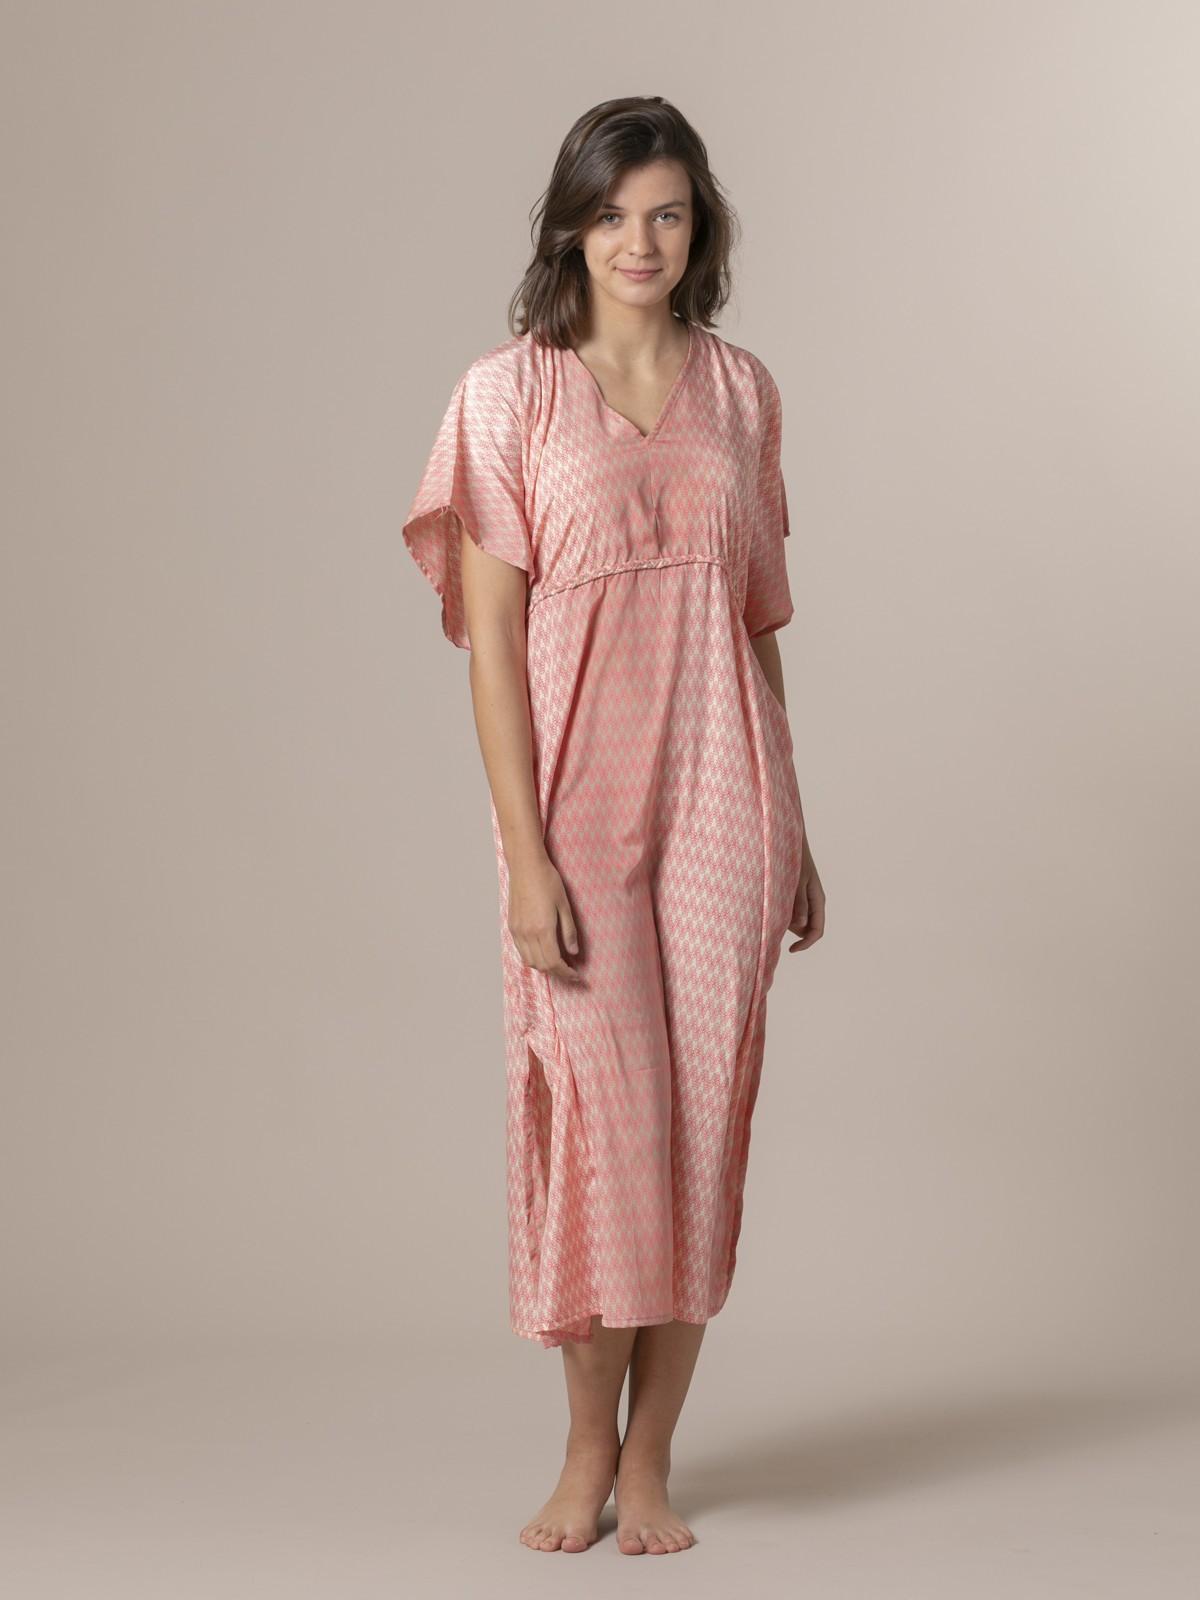 Woman Woman Flowy printed dress details Pinks